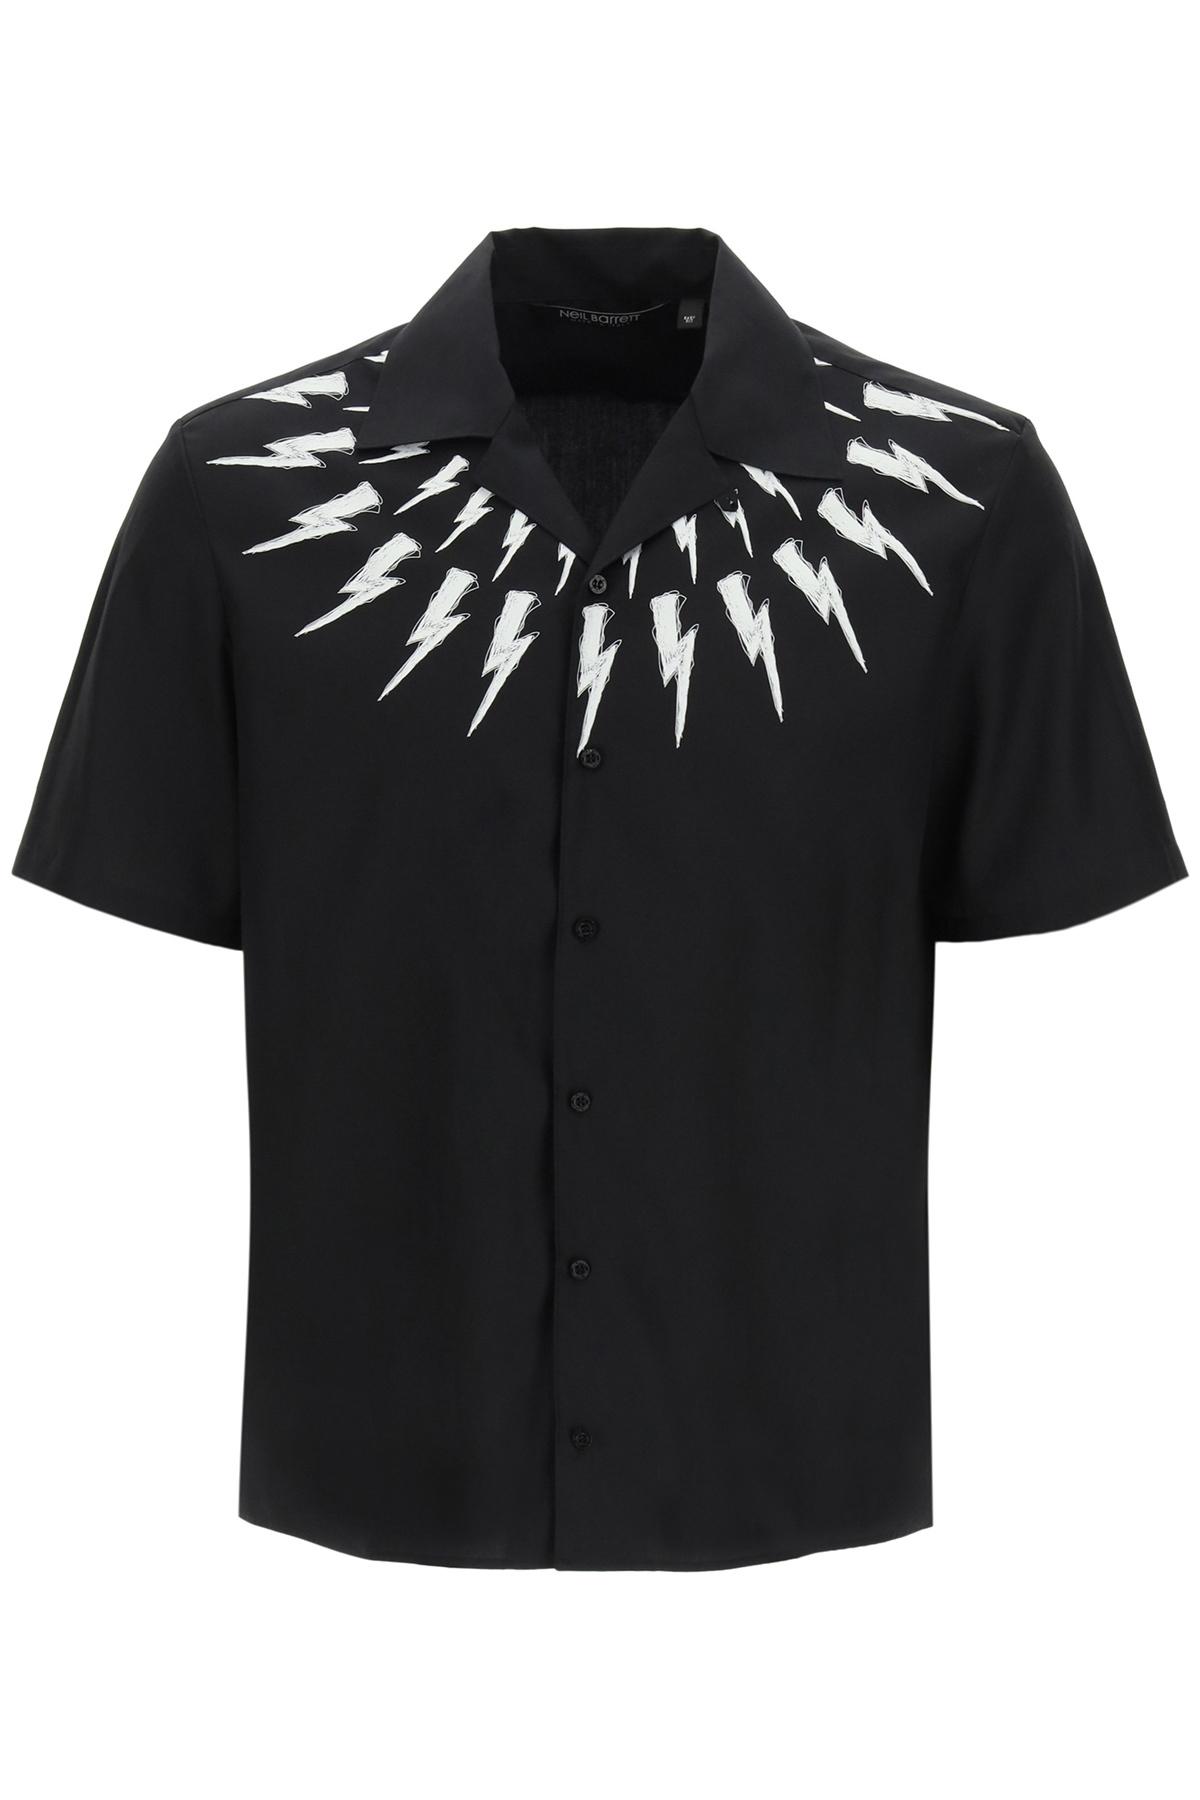 Neil barrett camicia hawaiian fair isle thunderbolt